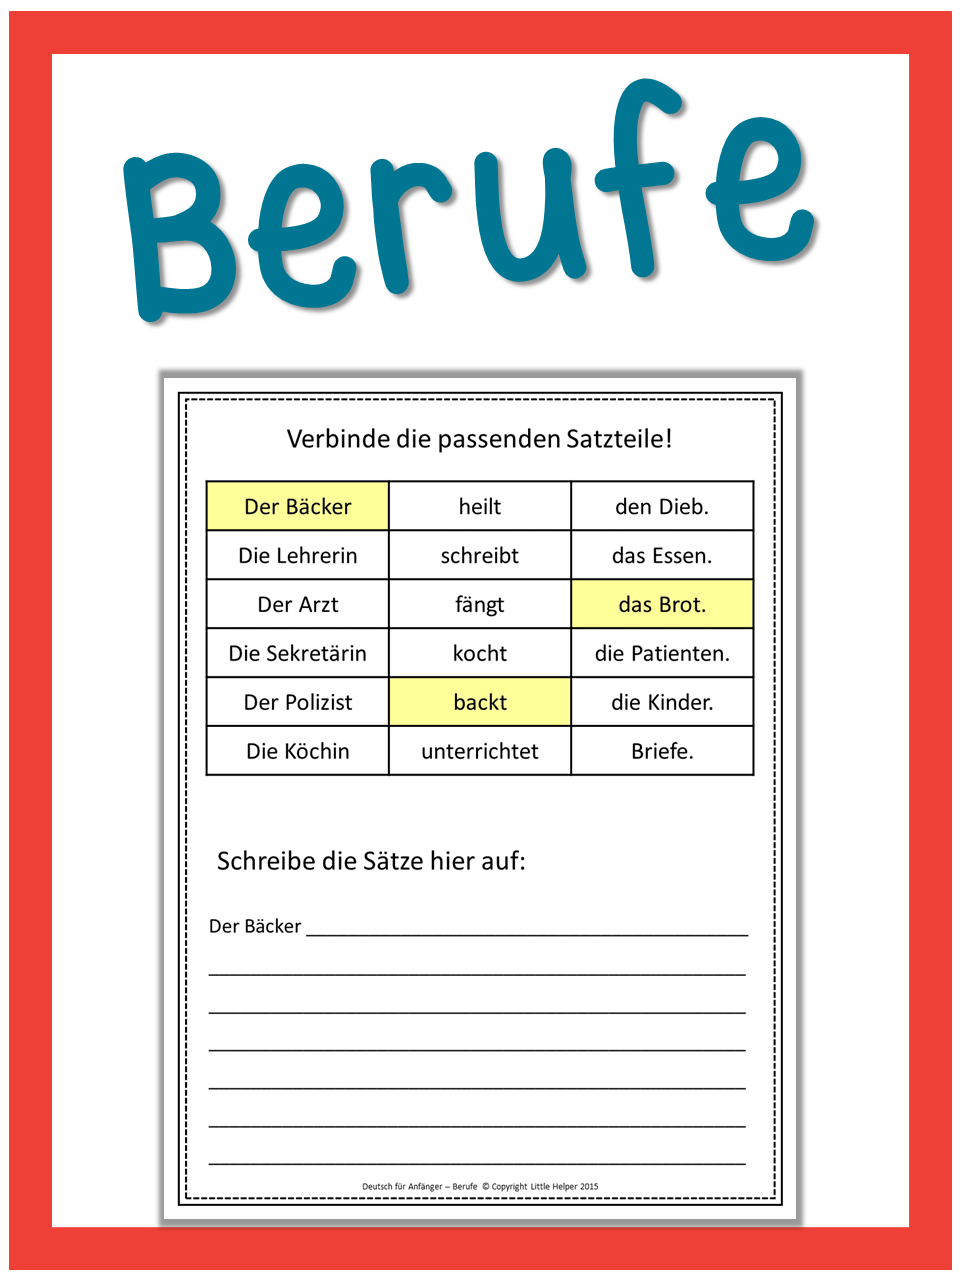 german professions worksheets german german language learning english vocabulary list. Black Bedroom Furniture Sets. Home Design Ideas